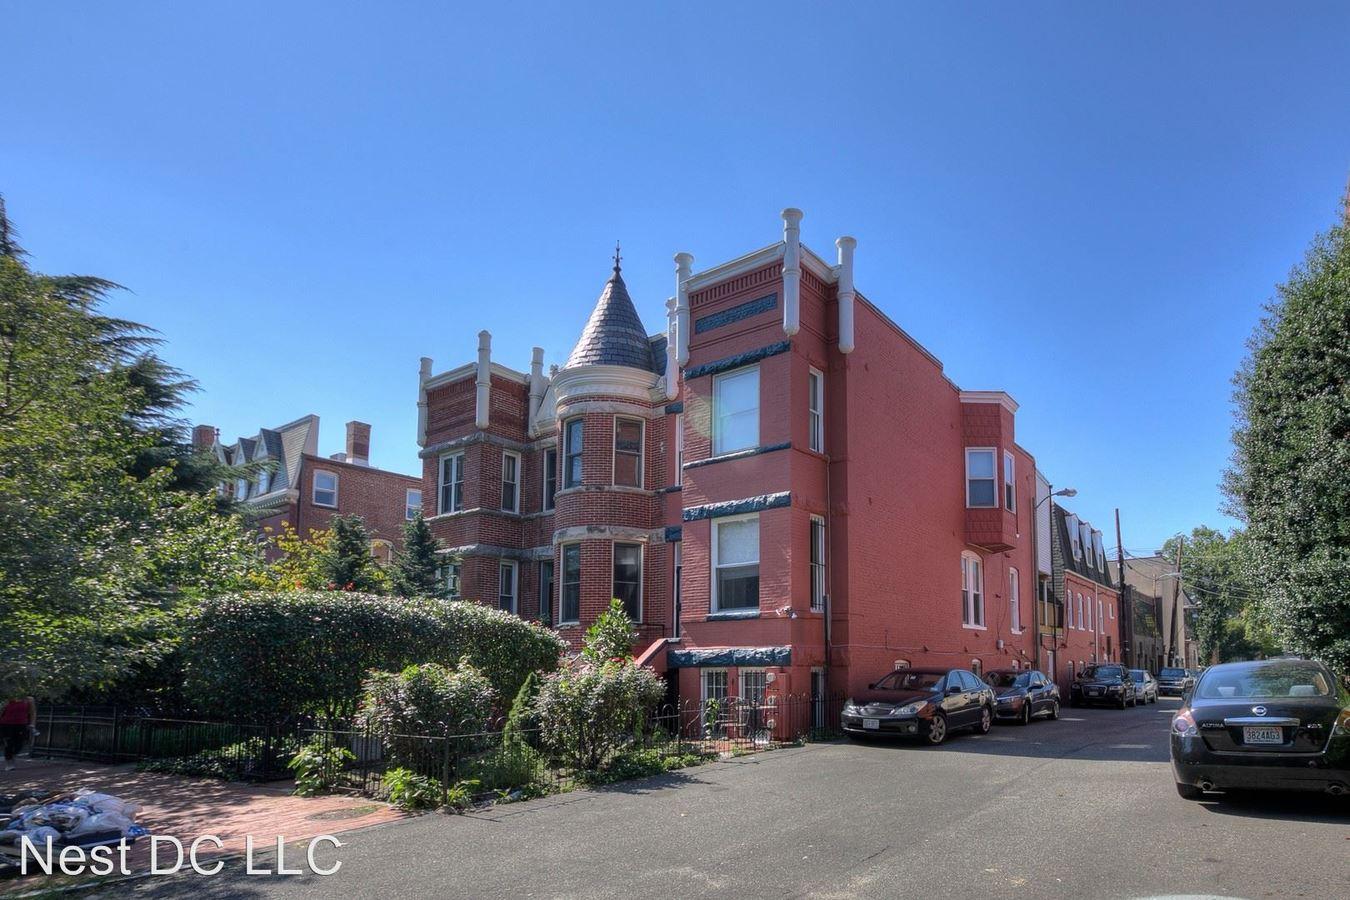 Swell 116 12Th St Ne Washington Dc Apartment For Rent Download Free Architecture Designs Grimeyleaguecom